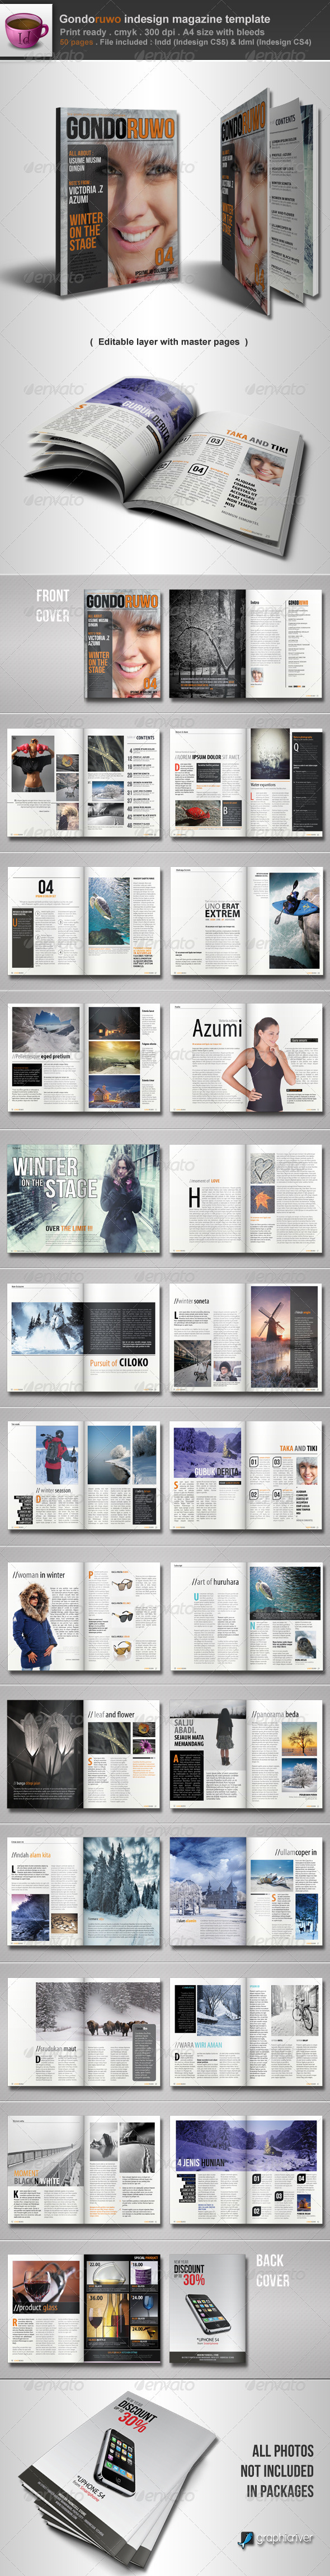 Gondoruwo Indesign Magazine Template - Magazines Print Templates